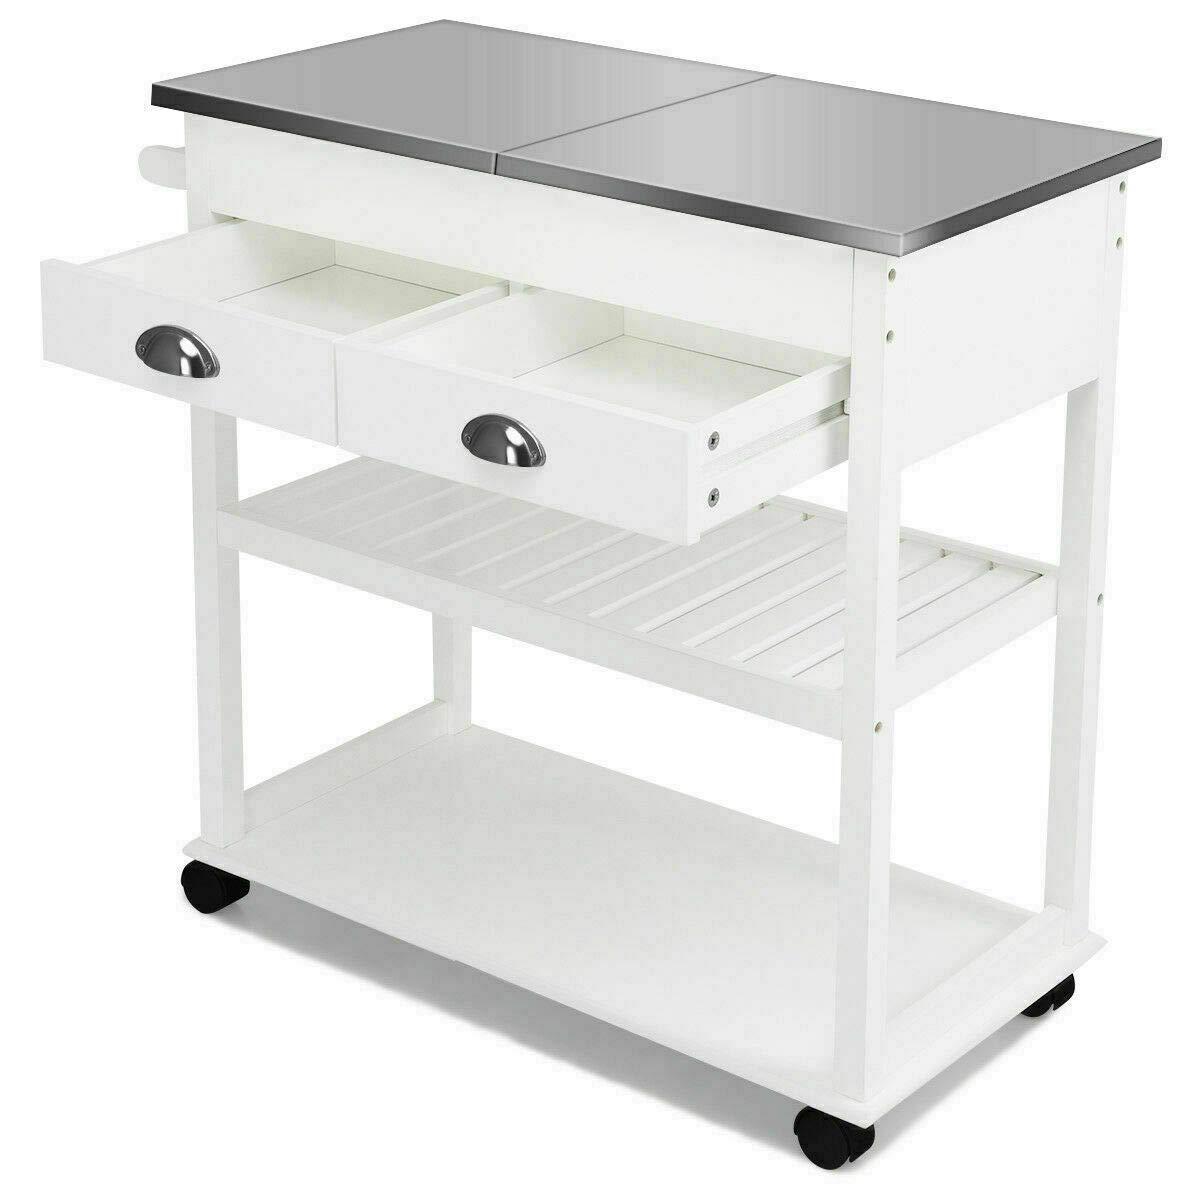 (Patio & Garden Furniture) Rolling Kitchen Island Trolley Cart Stainless Steel Flip Tabletop w/Drawer White by (Patio & Garden Furniture)